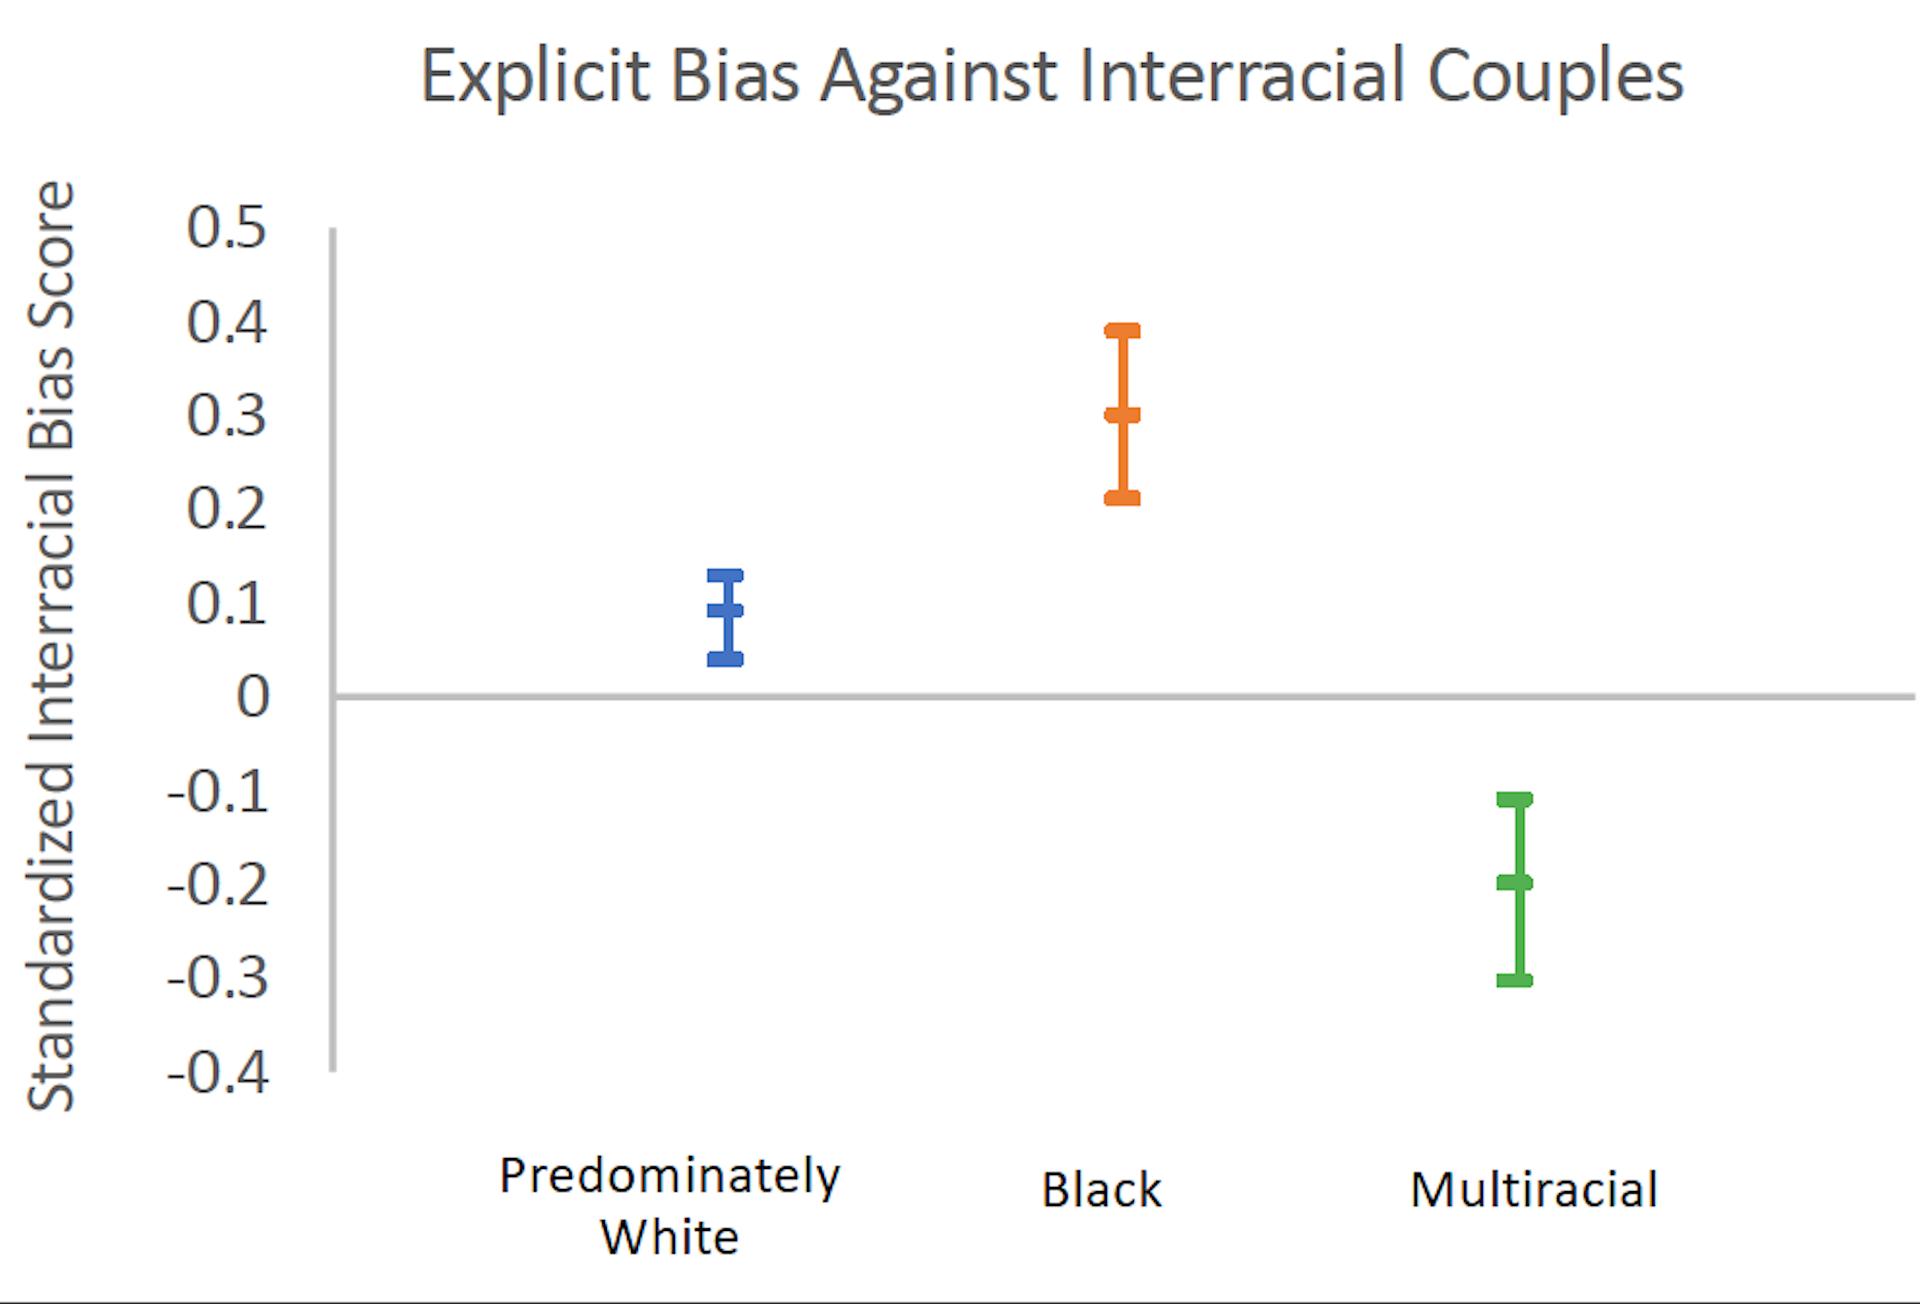 Interracial dating poll